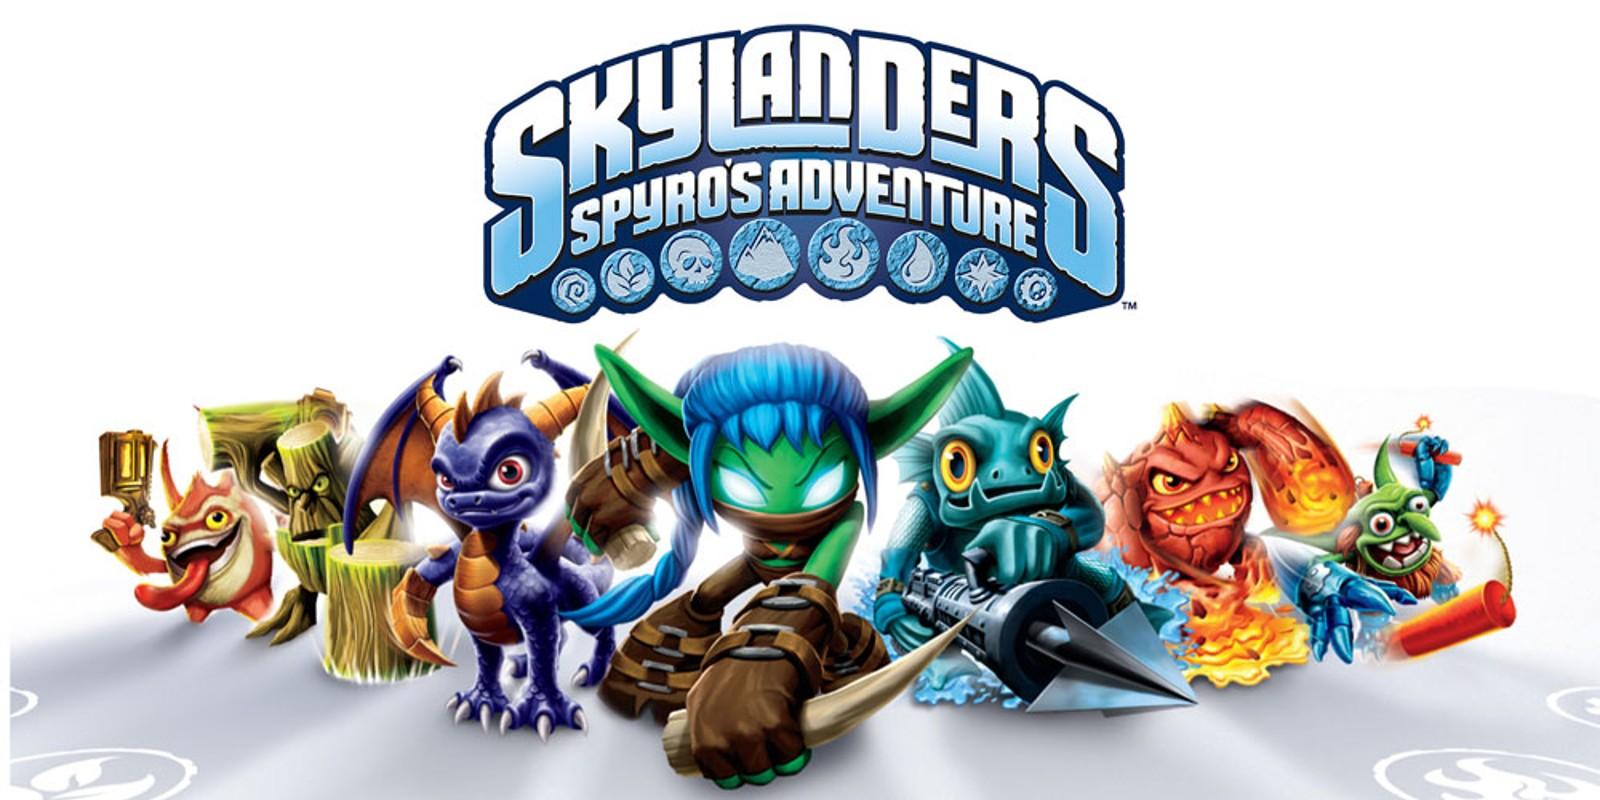 Kids Animal Wallpaper Skylanders Spyro S Adventure Nintendo 3ds Games Nintendo